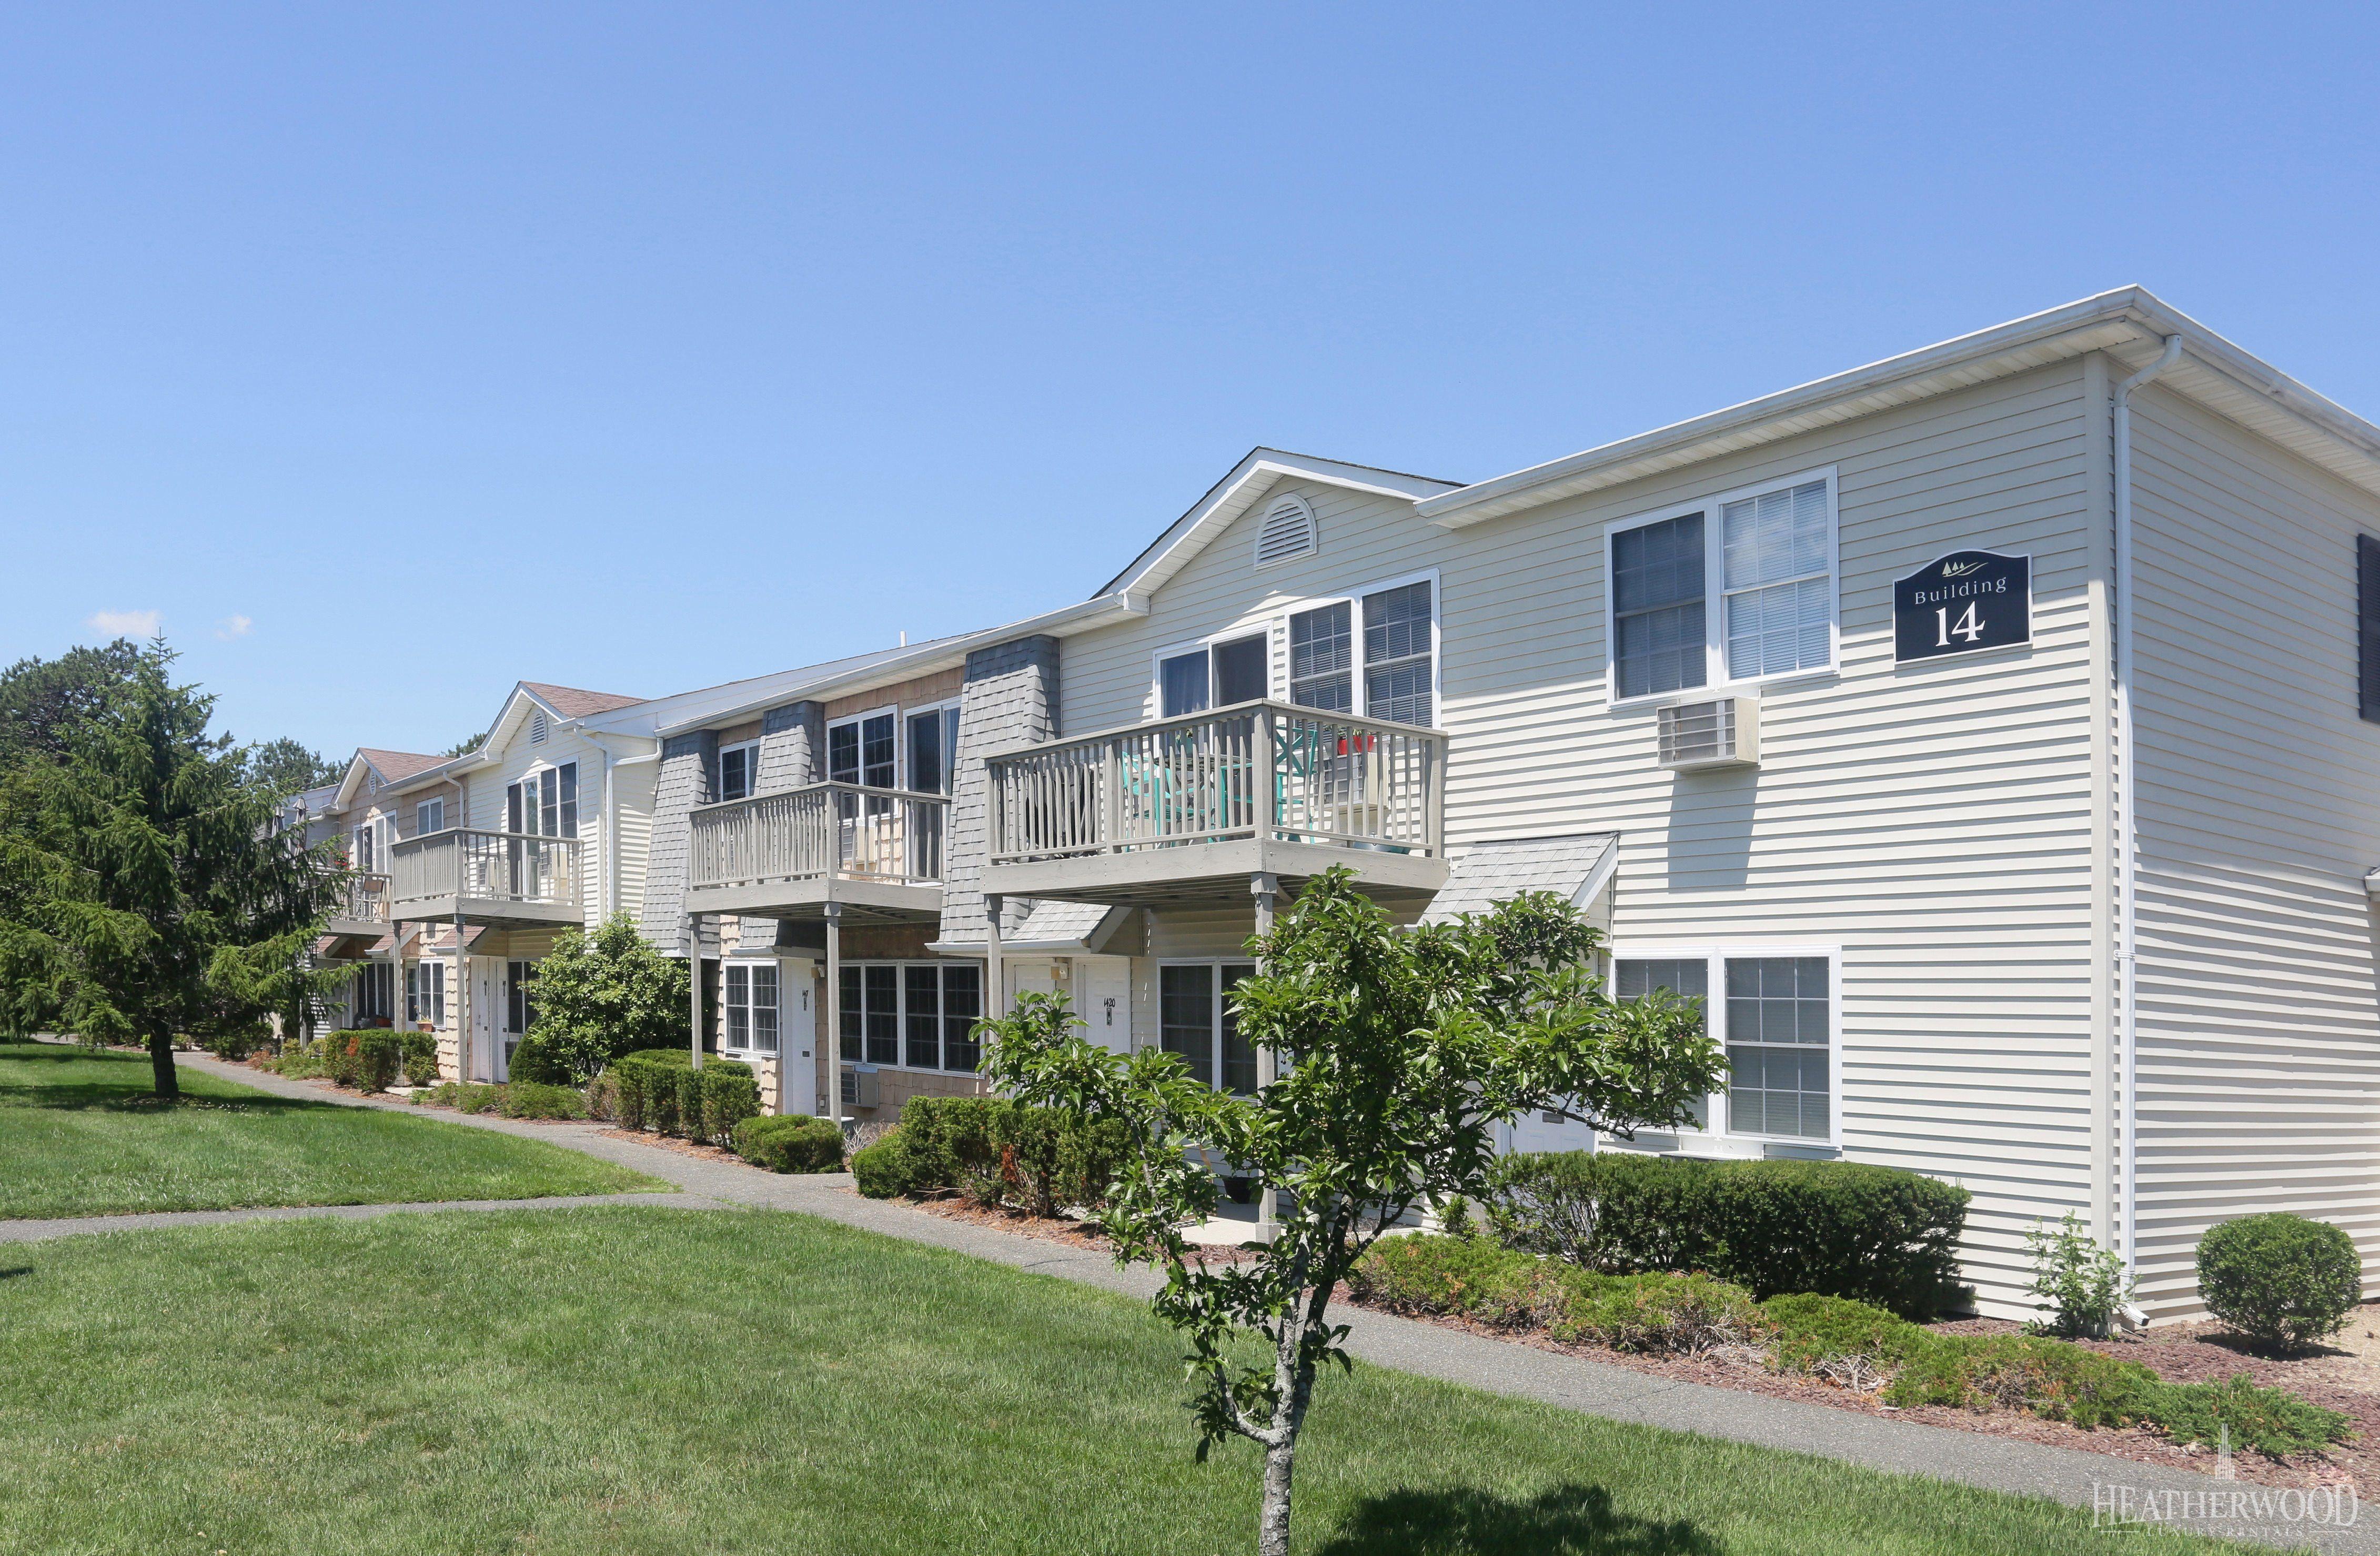 Spruce Pond Apartments Pond, Garage doors, House styles